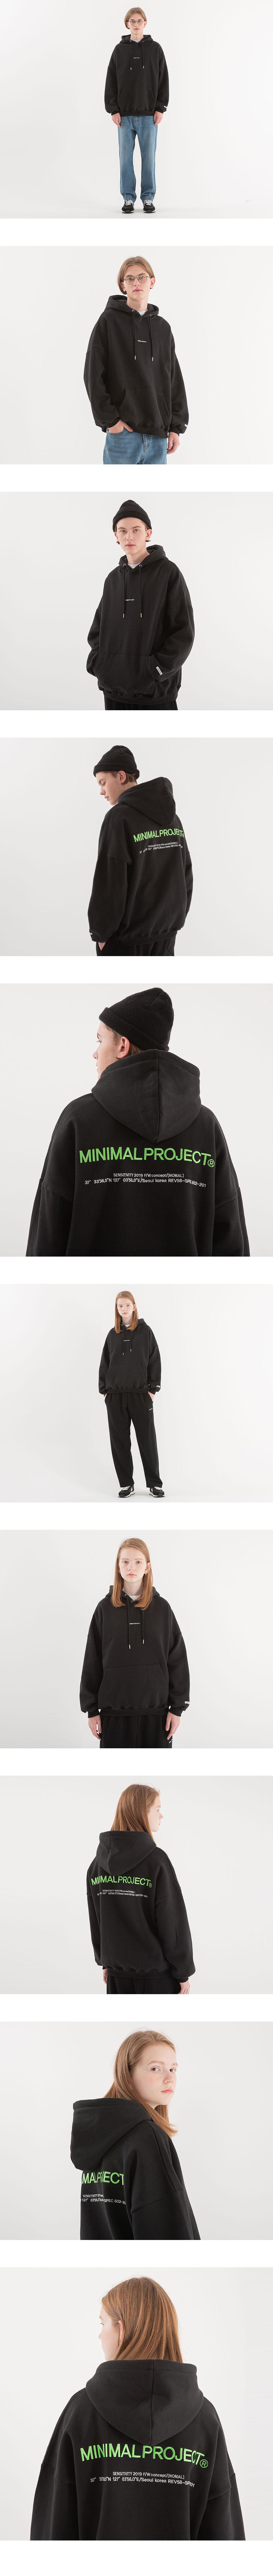 [minimal project] 미니멀프로젝트 포지션 넘버 폰트 오버핏 후드 MHT106 [BLACK]